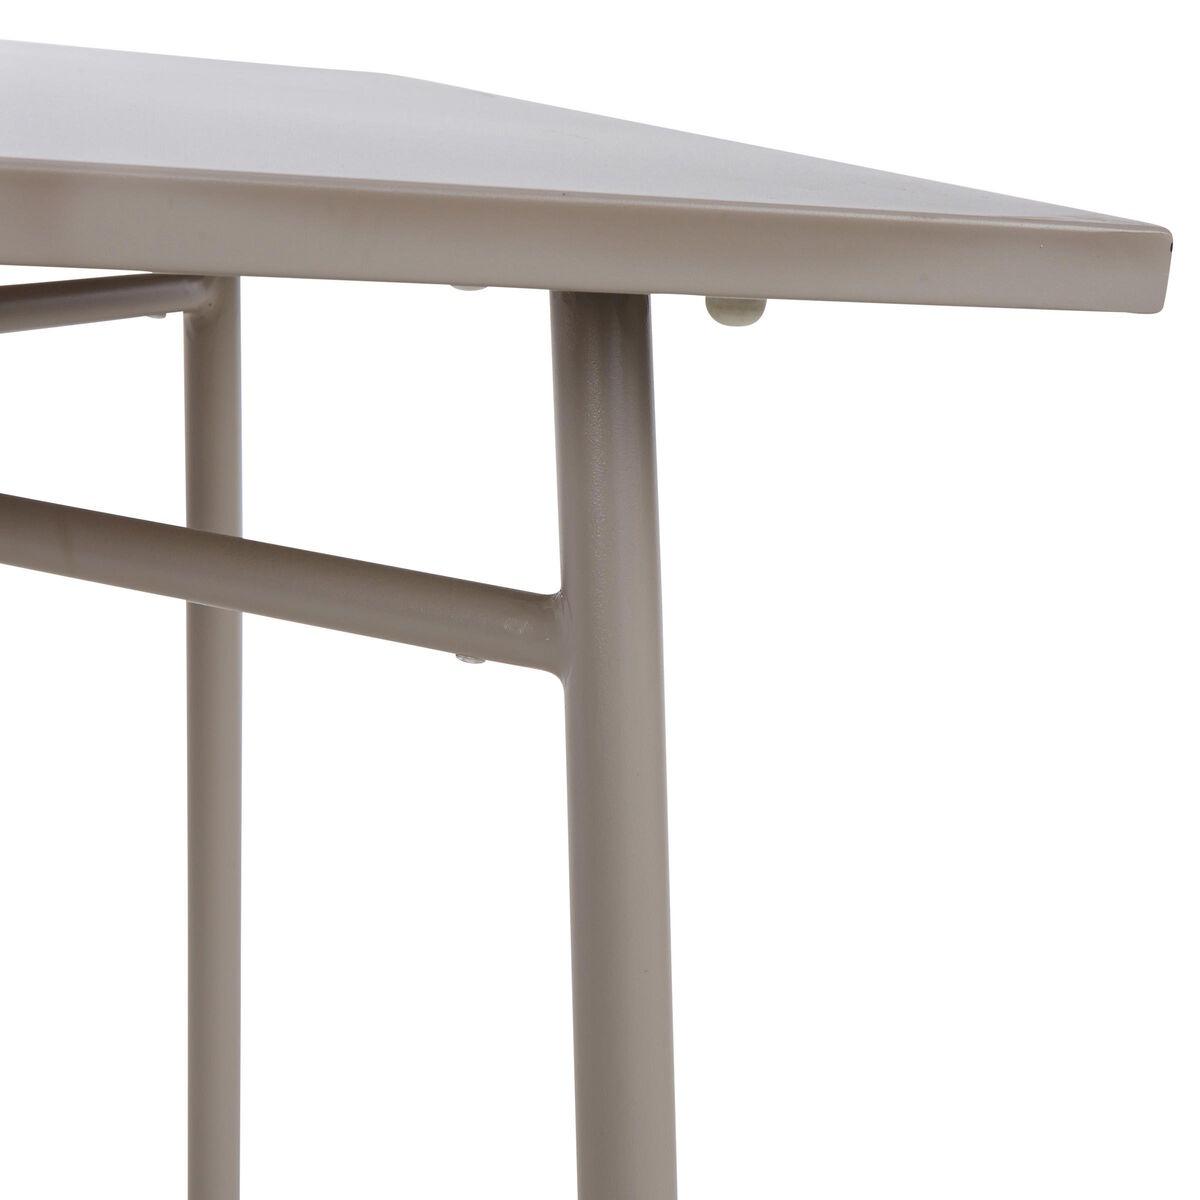 CARREFOUR Tisch 75x75 cm taupe